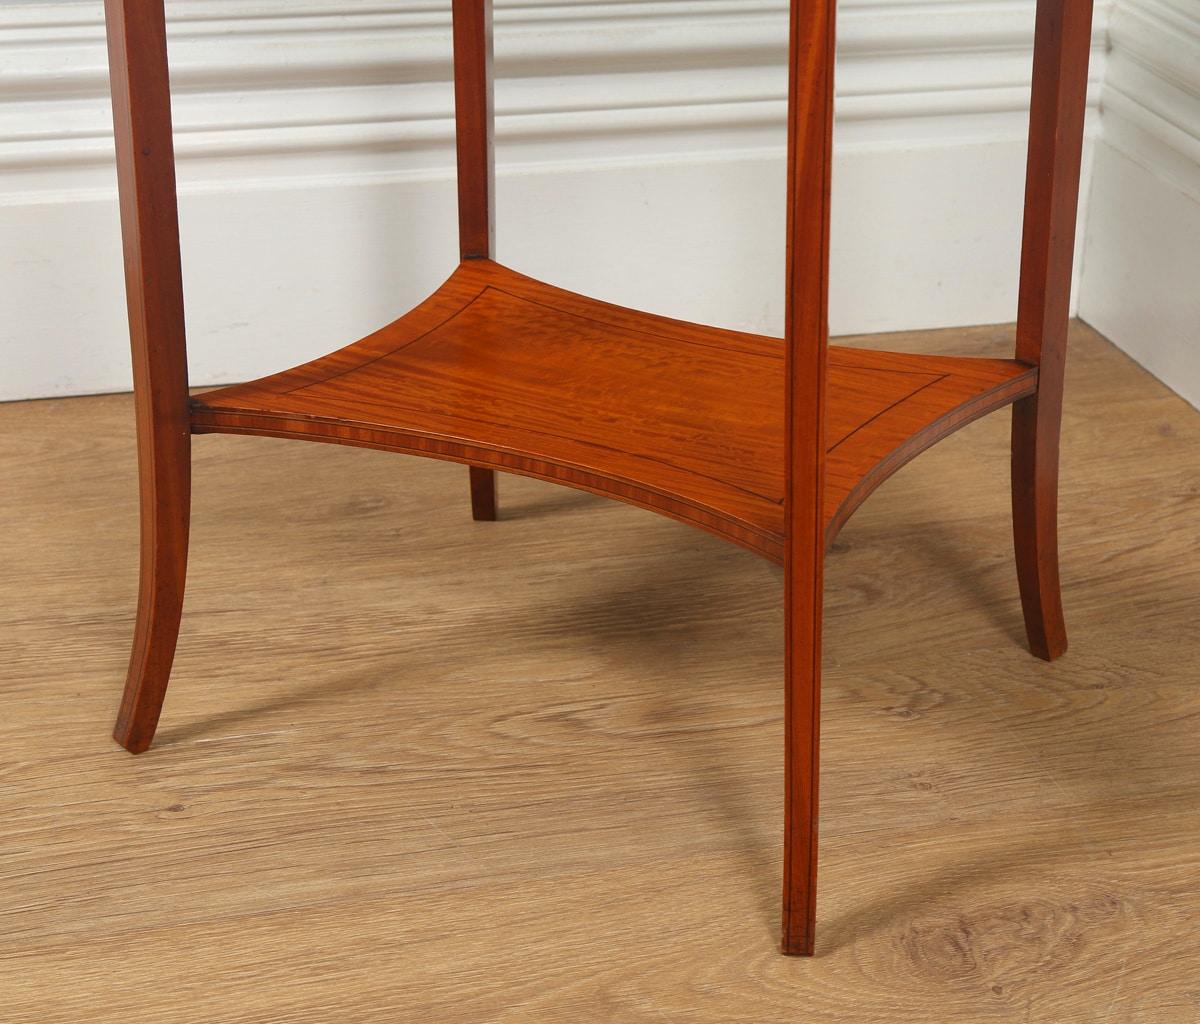 Antique english edwardian sheraton style satinwood for Furniture kelsall